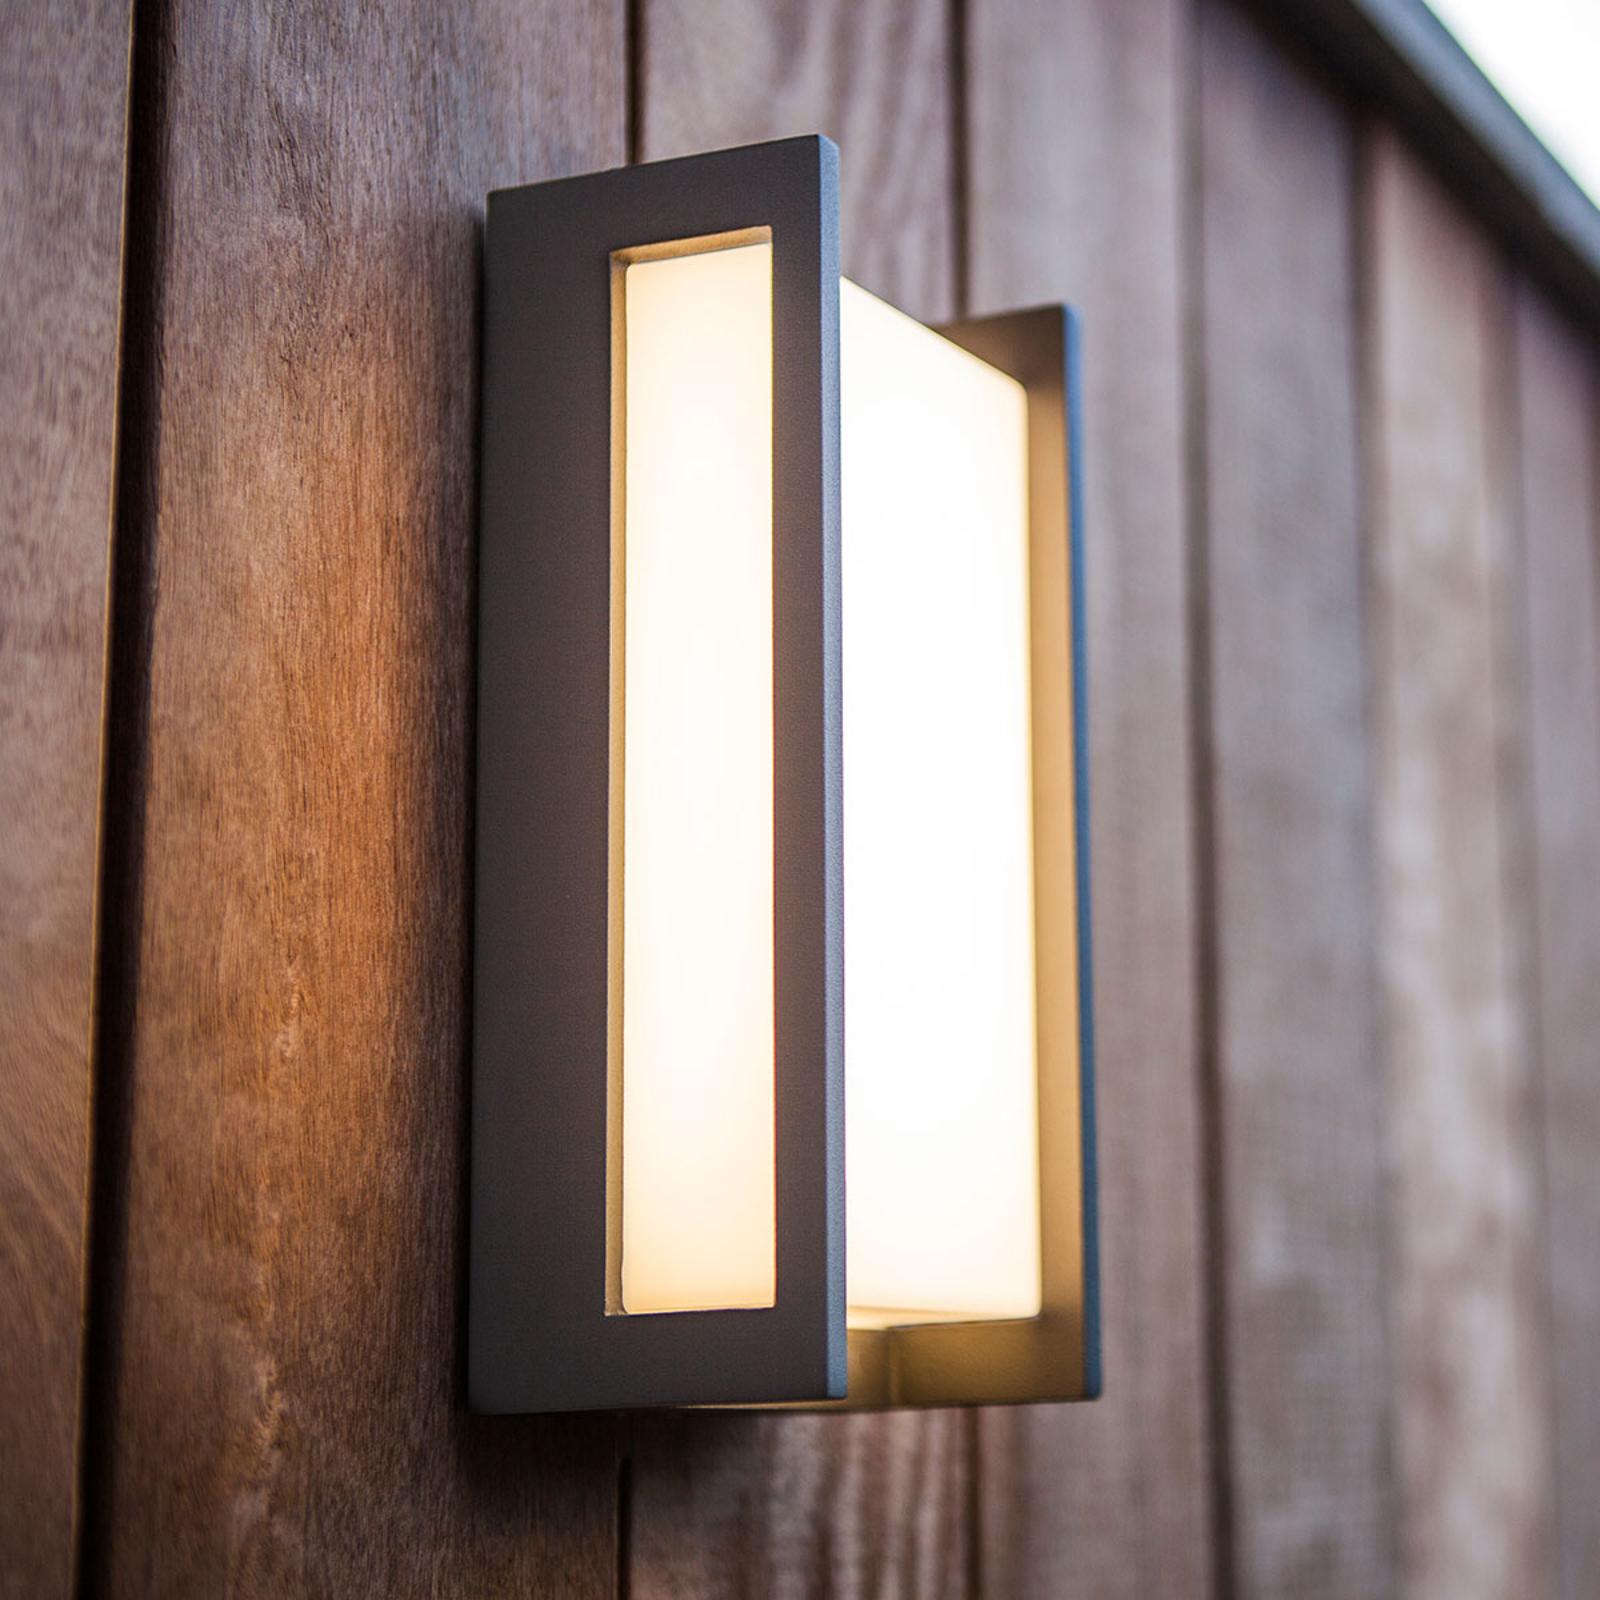 Rechte LED buitenwandlamp Qubo